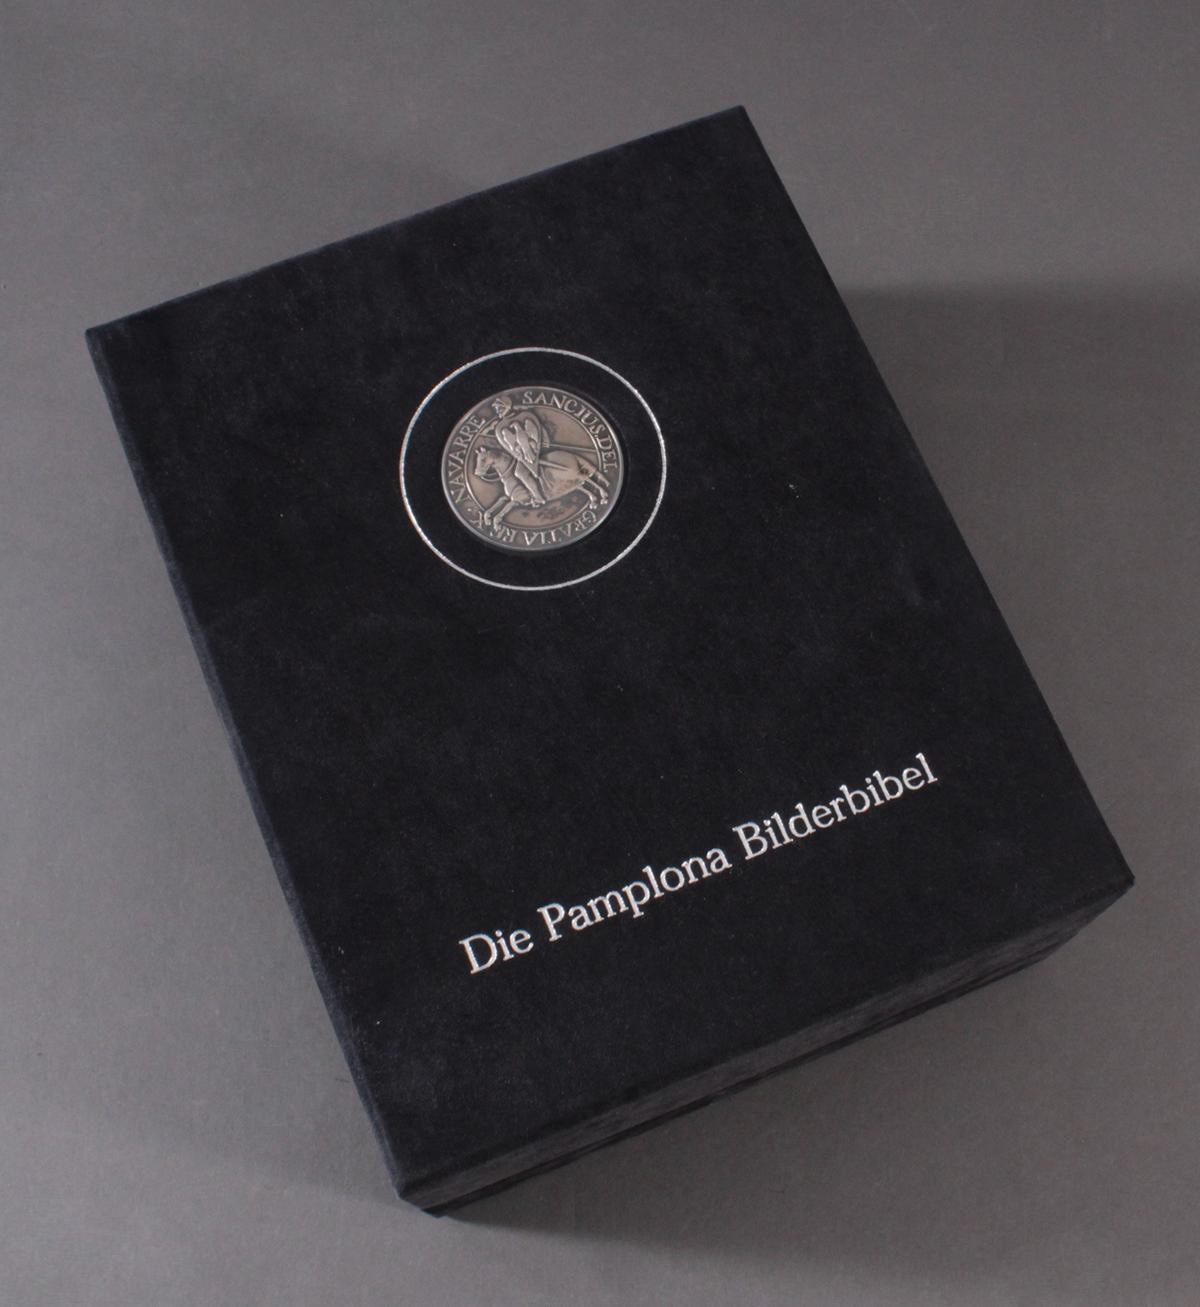 Pambloma Bilderbibel des Königs Sancho el Fuerte, Faksimile-4